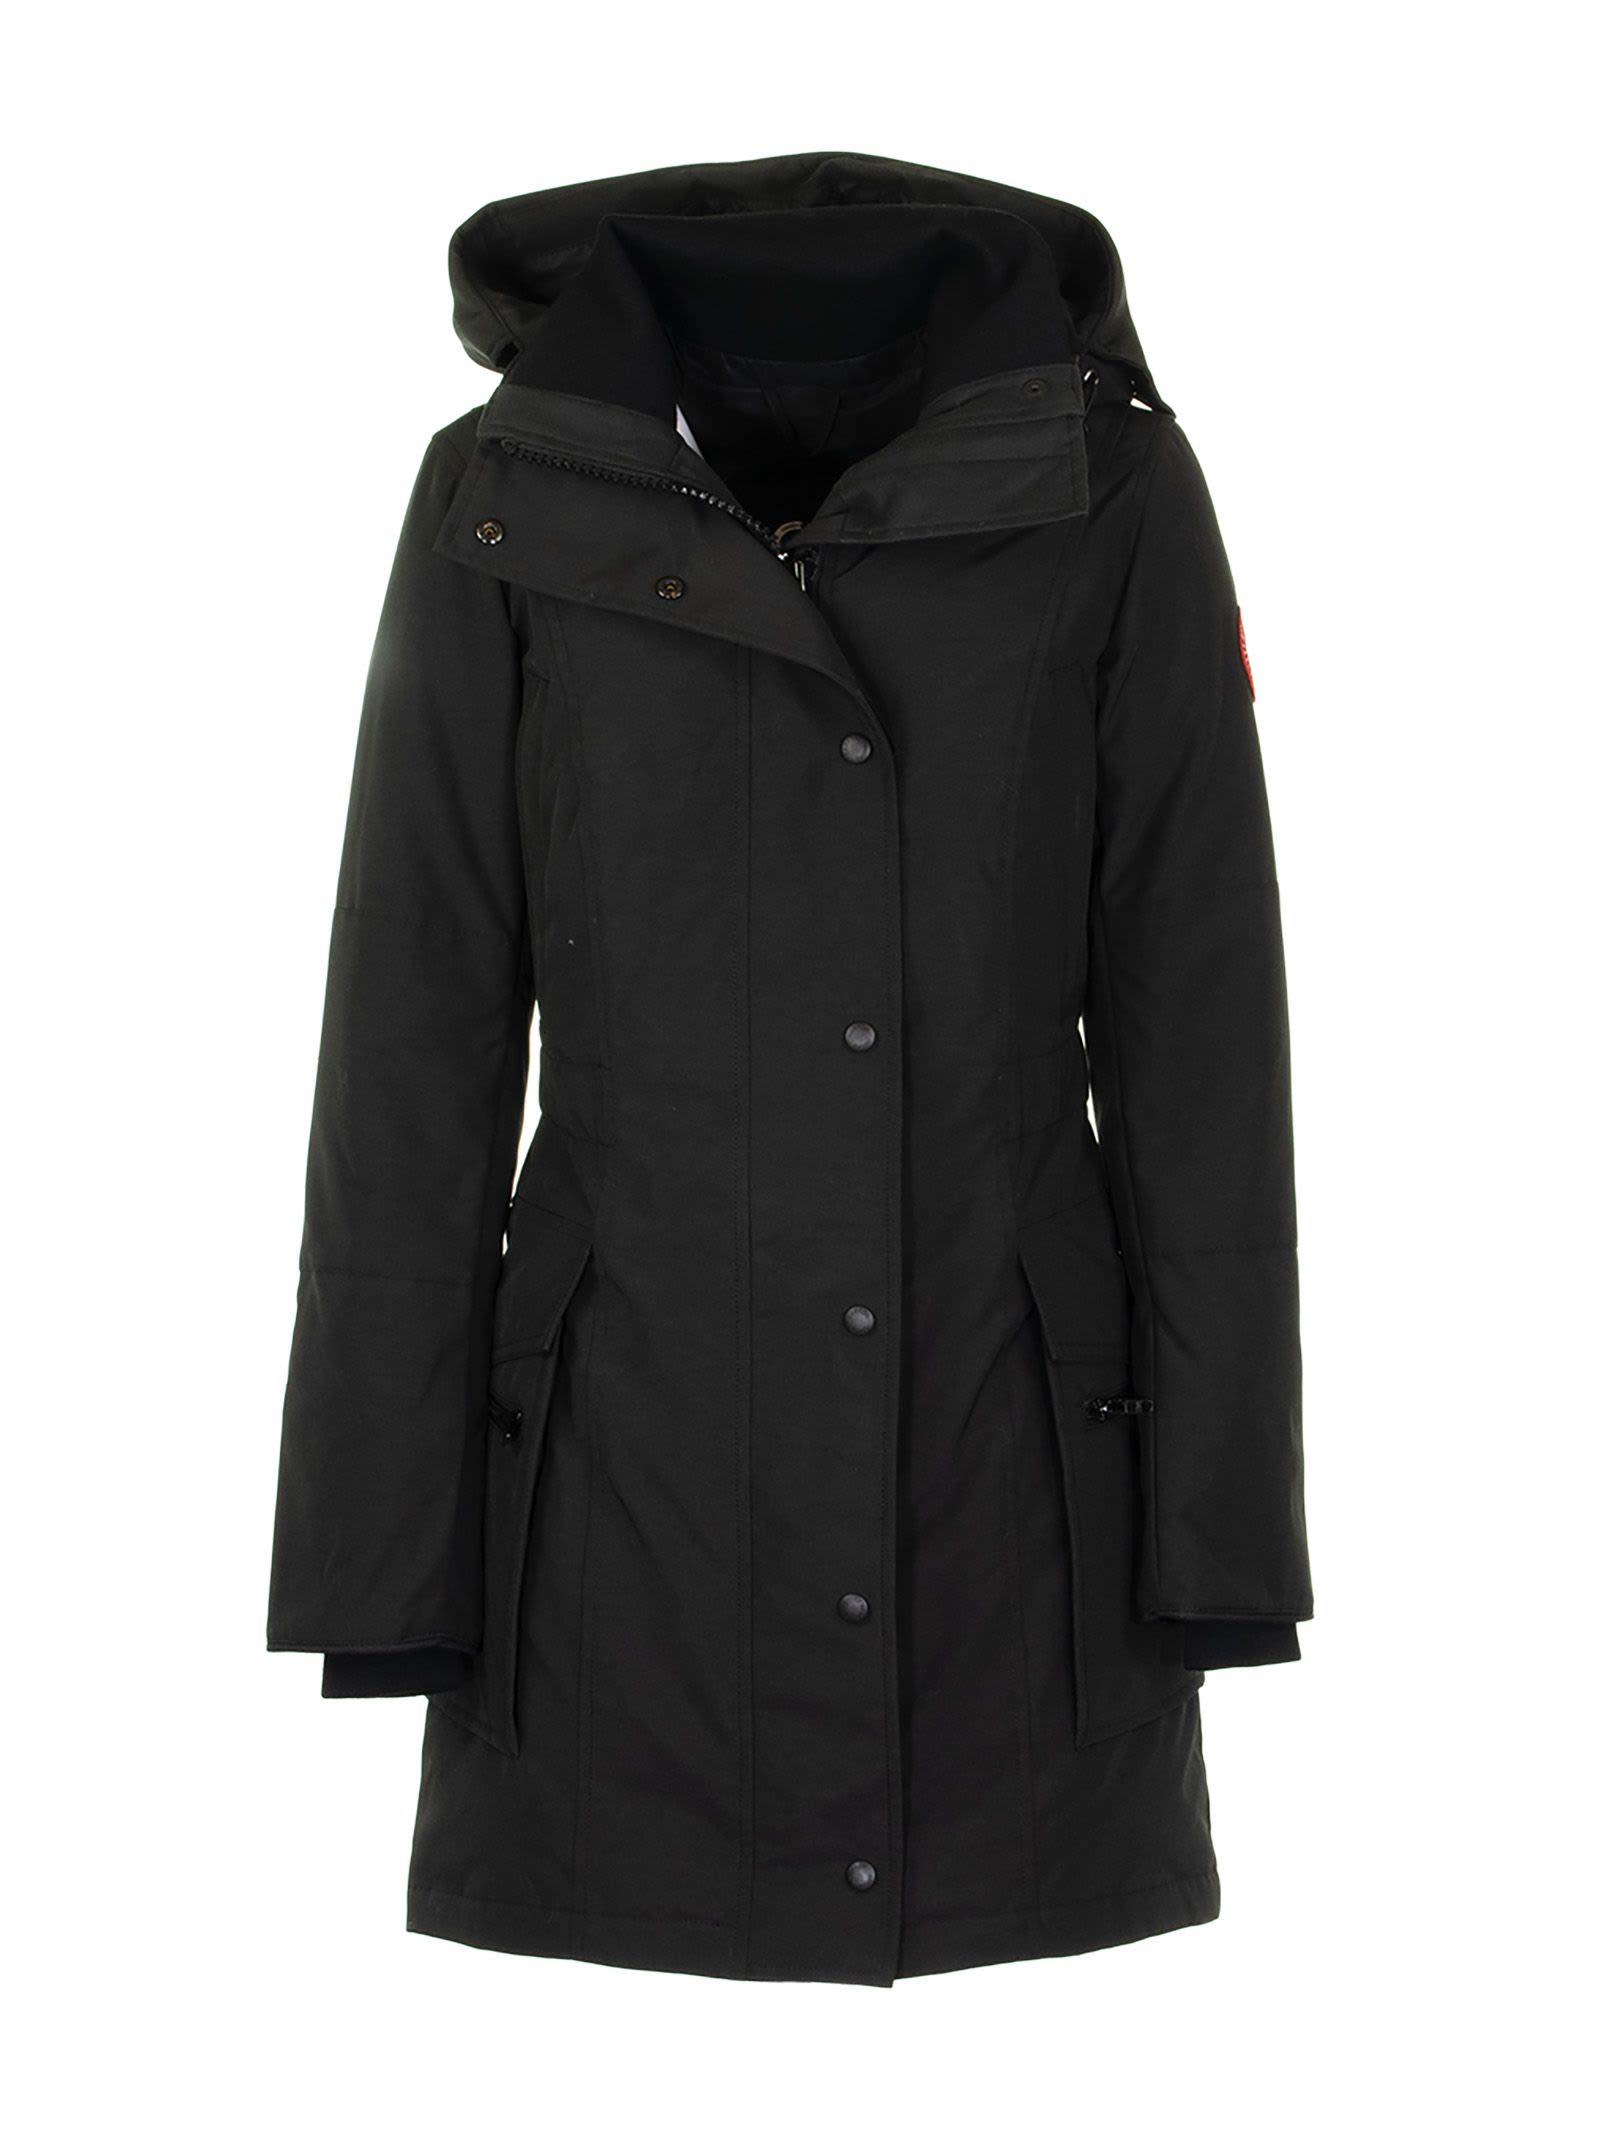 Canada Goose Black Parka Jacket